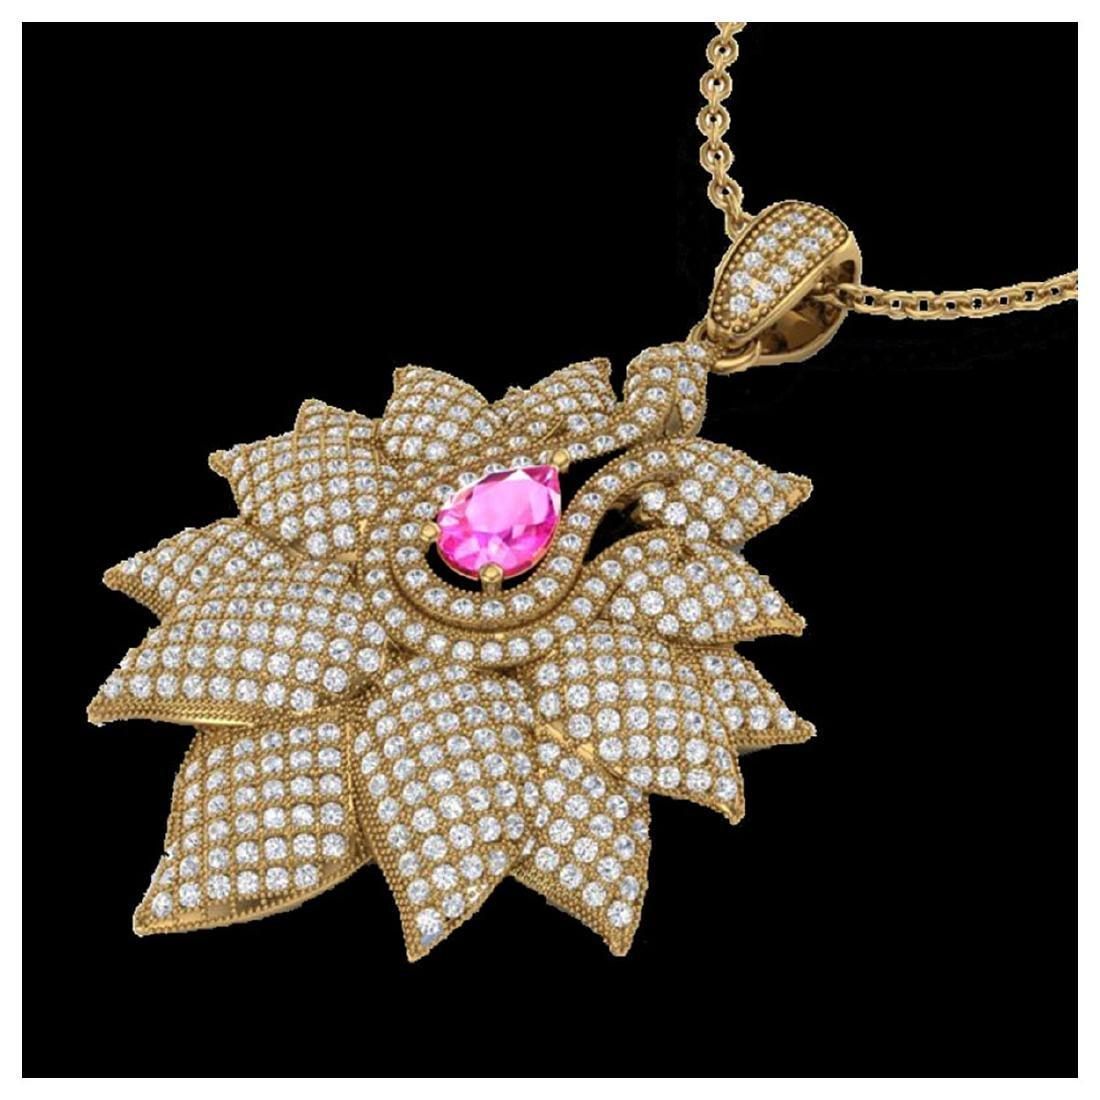 3 ctw Pink Sapphire & VS/SI Diamond Necklace 18K Yellow